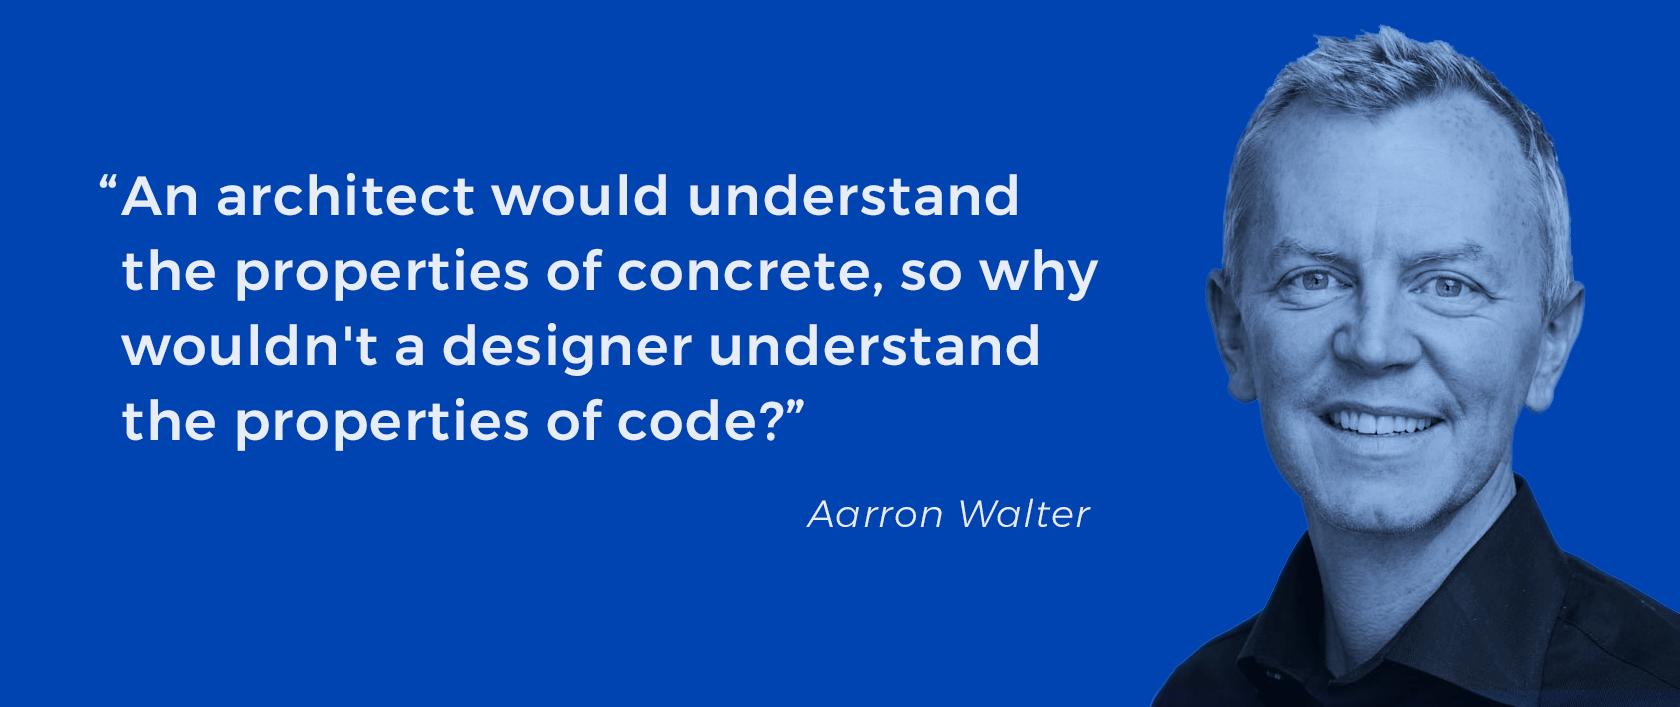 About designer and developer collaboration.